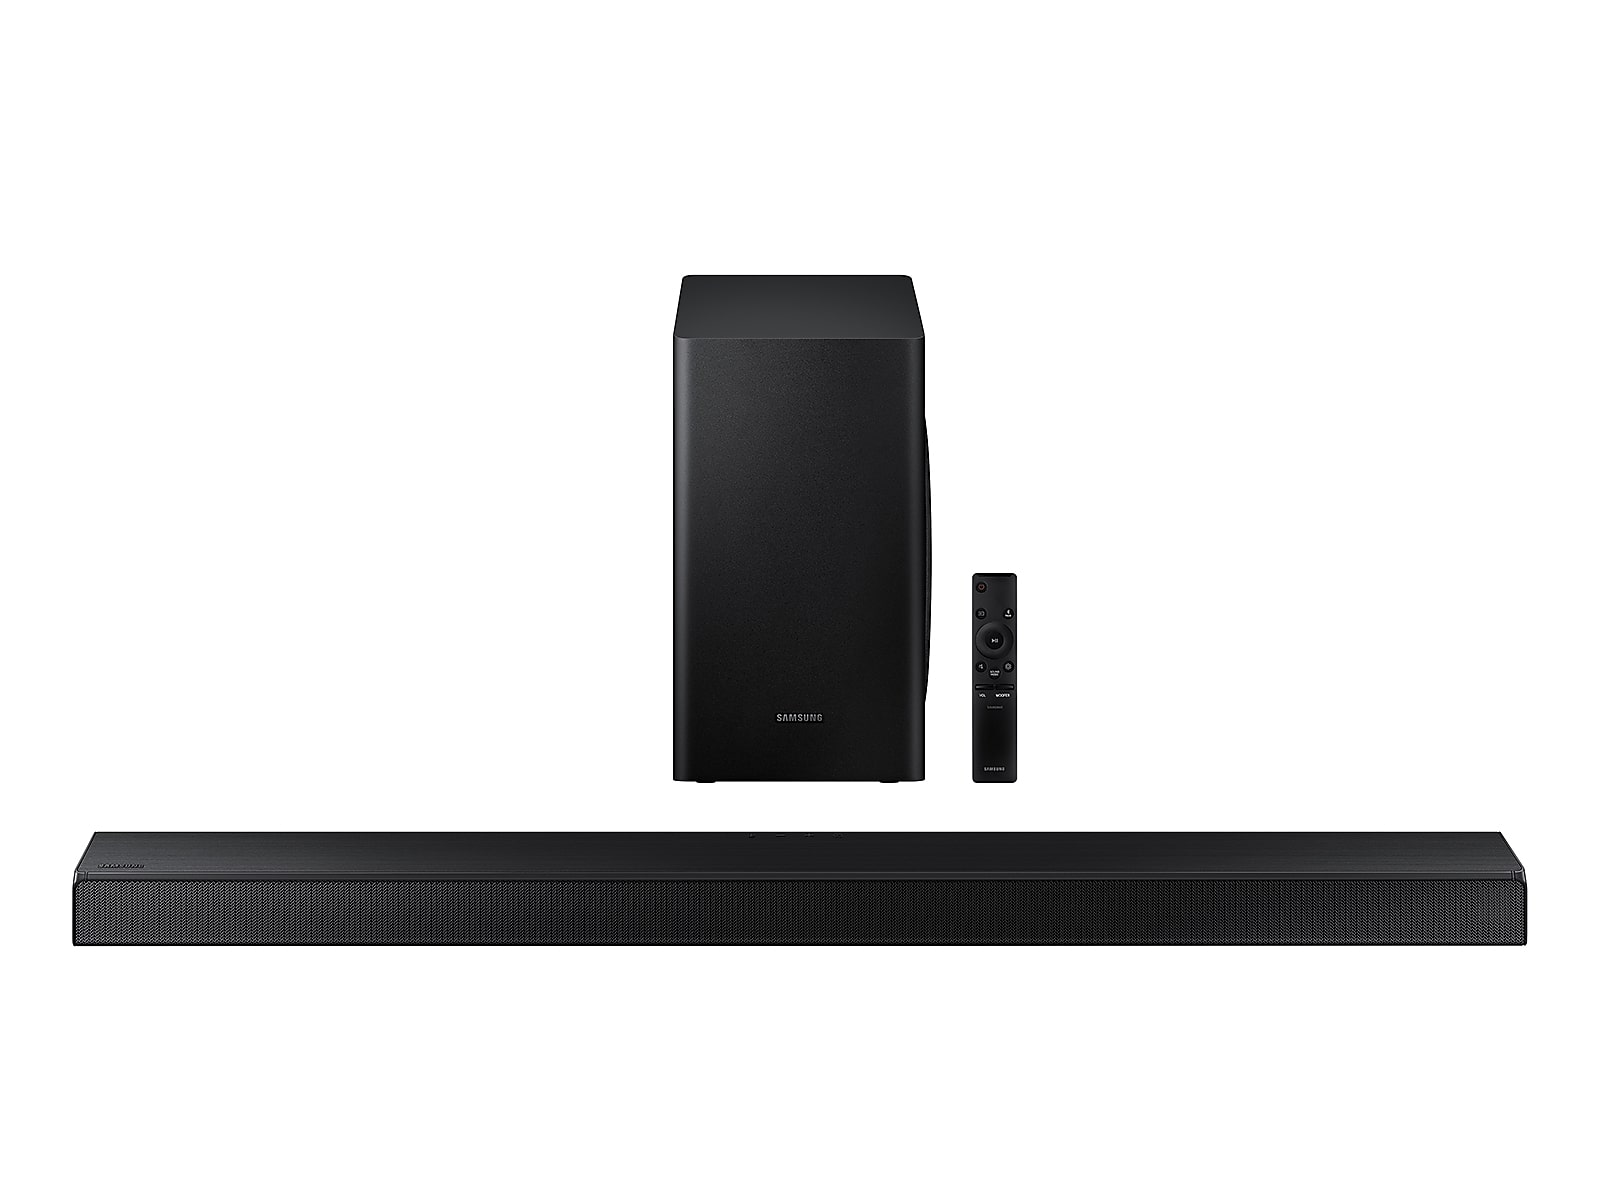 Samsung HW-T650 3.1ch Soundbar w/ 3D Surround Sound in Black (2020)